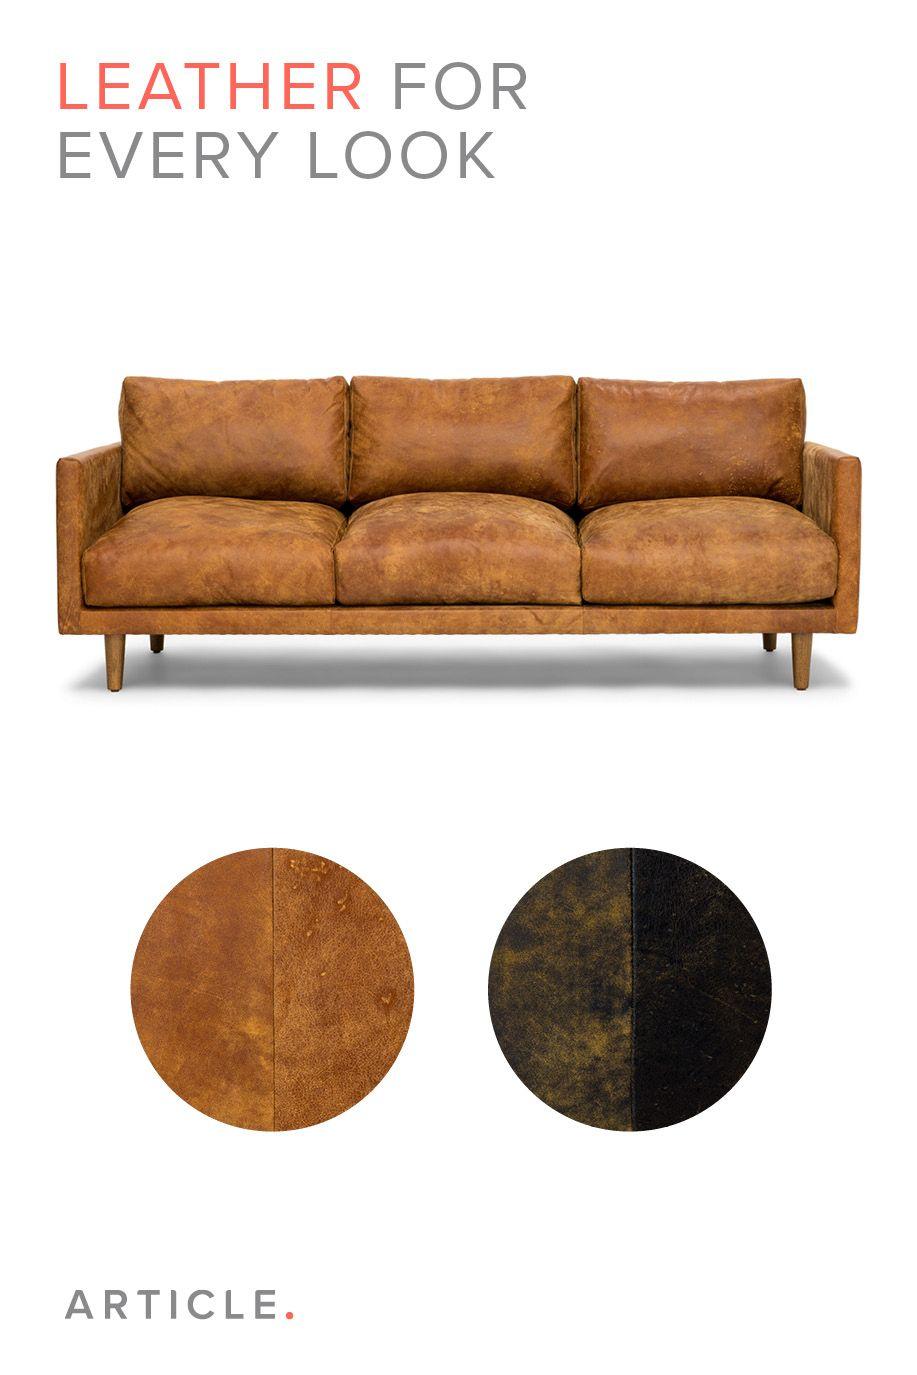 Tan Brown Leather Sofa   Upholstered   Article Nirvana Modern Furniture